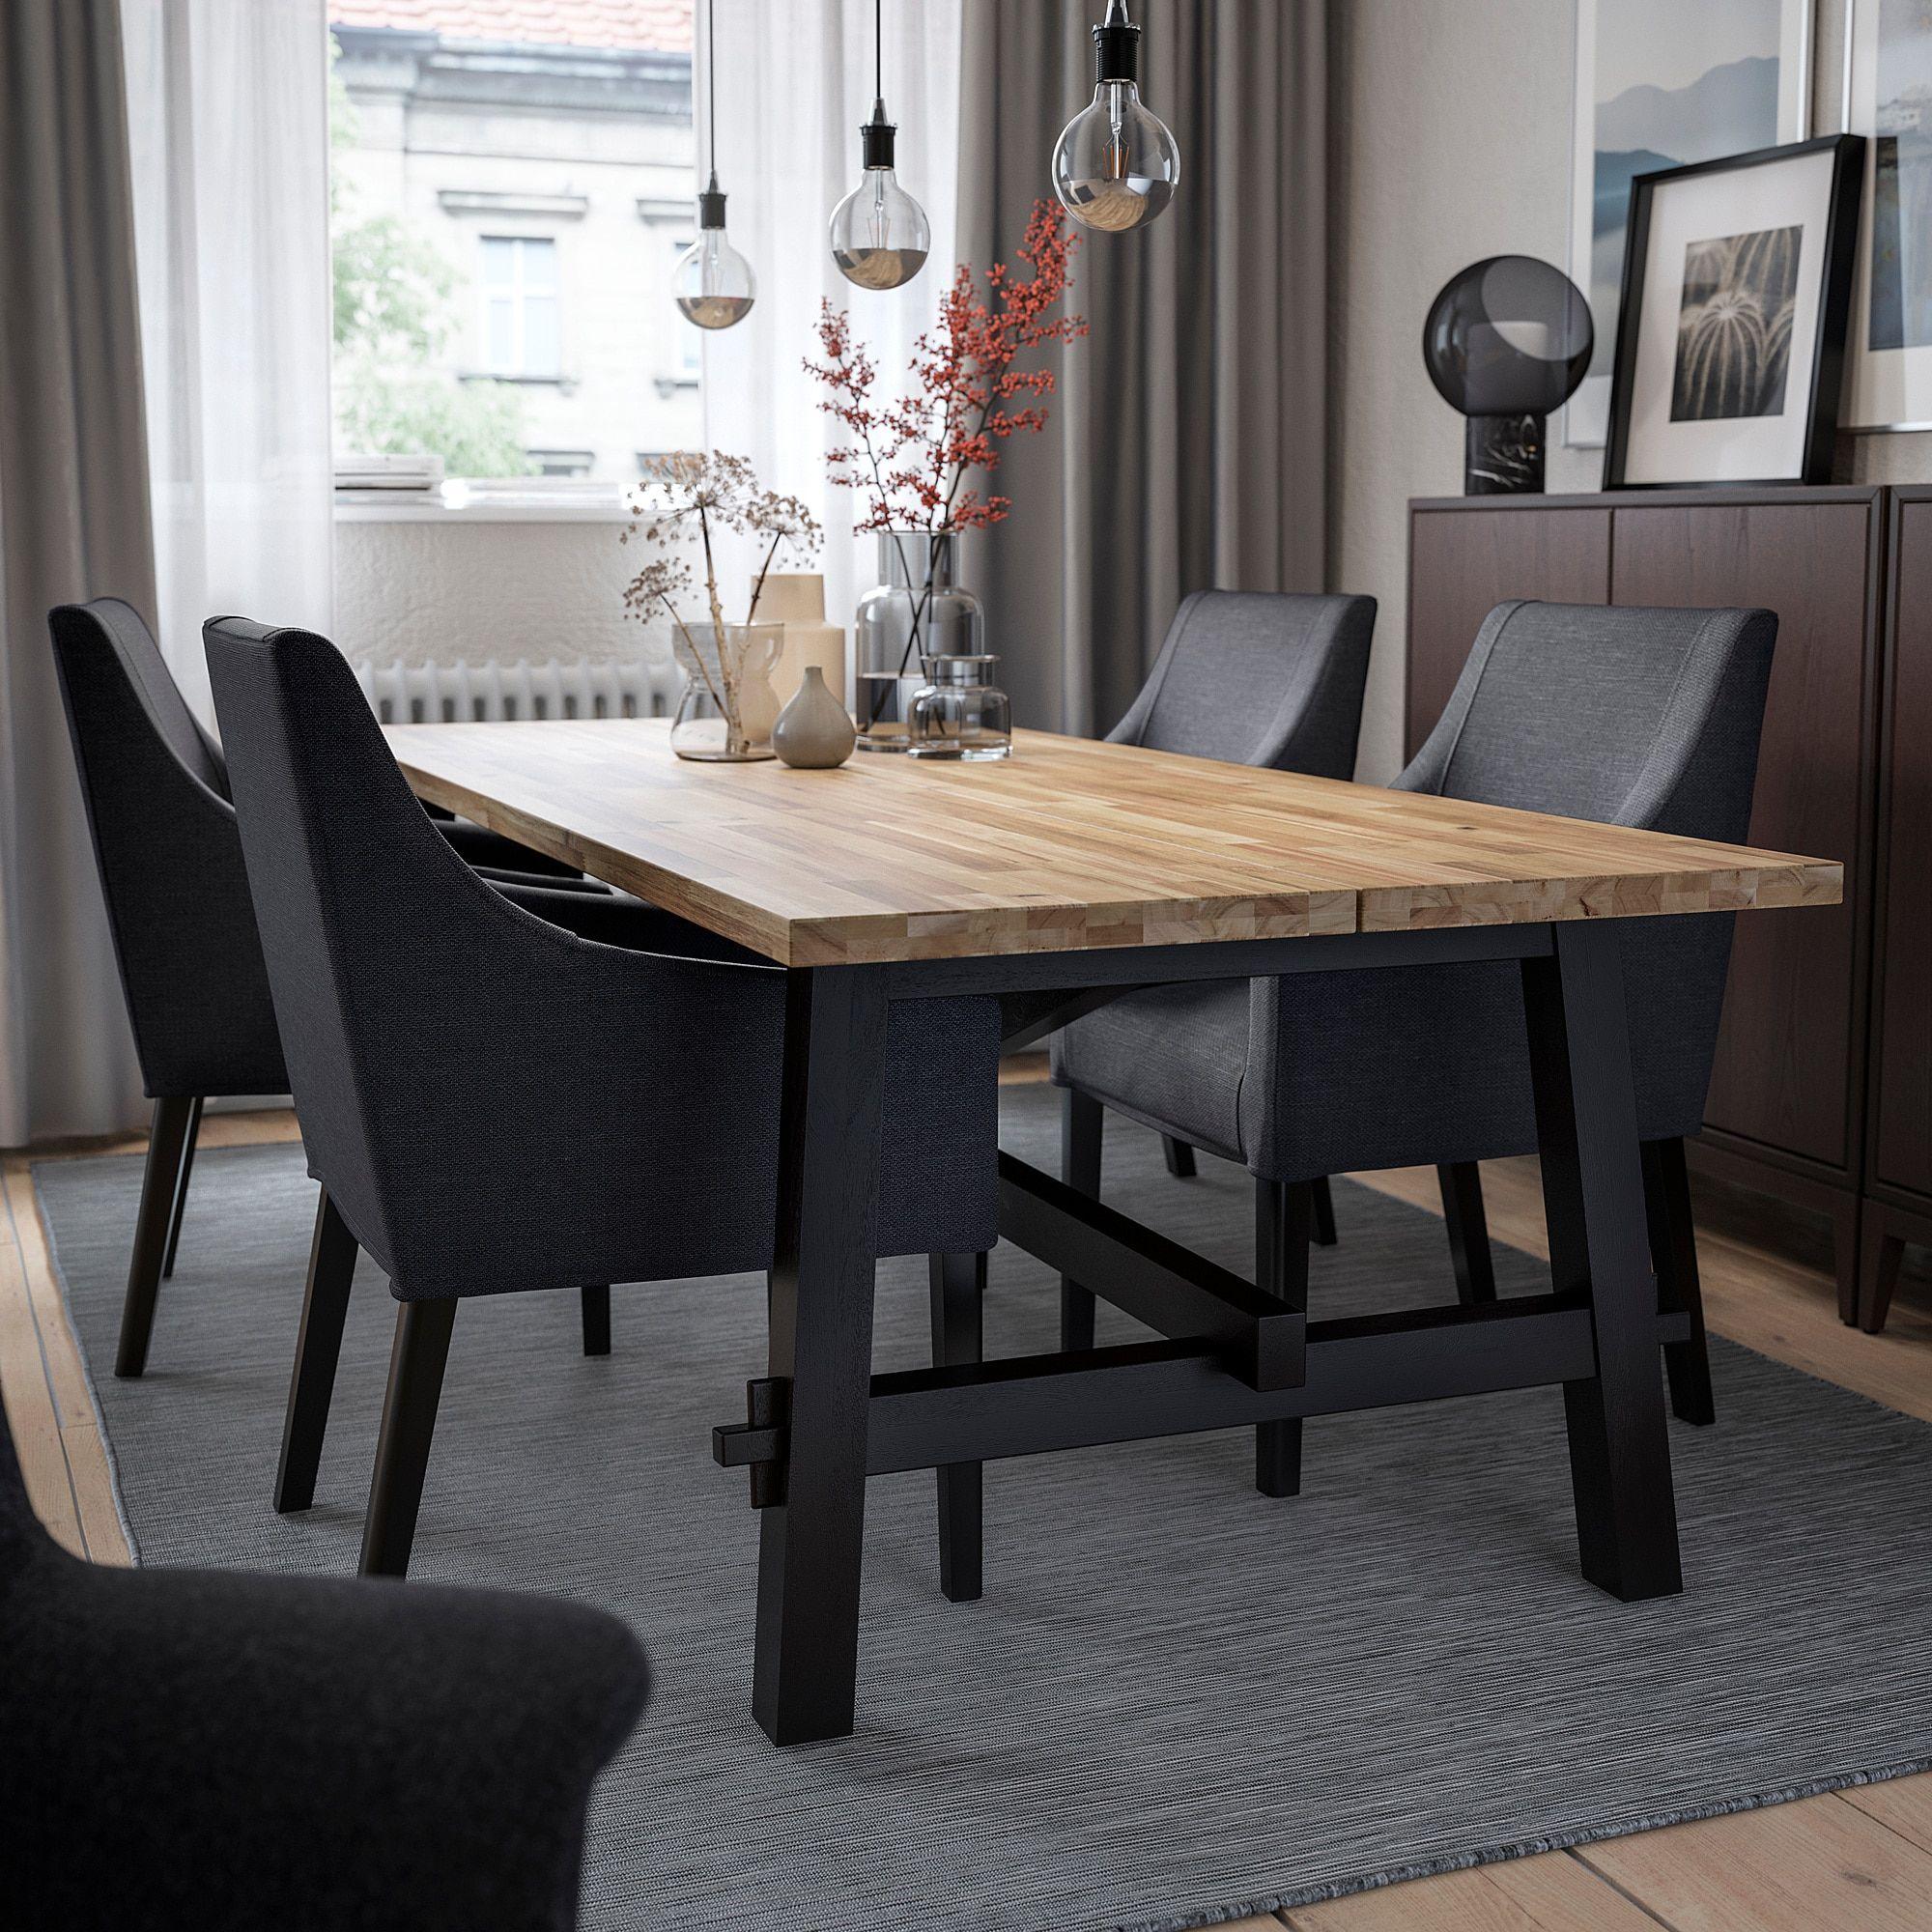 Skogsta Sakarias Table And 4 Chairs Acacia Black Sporda Dark